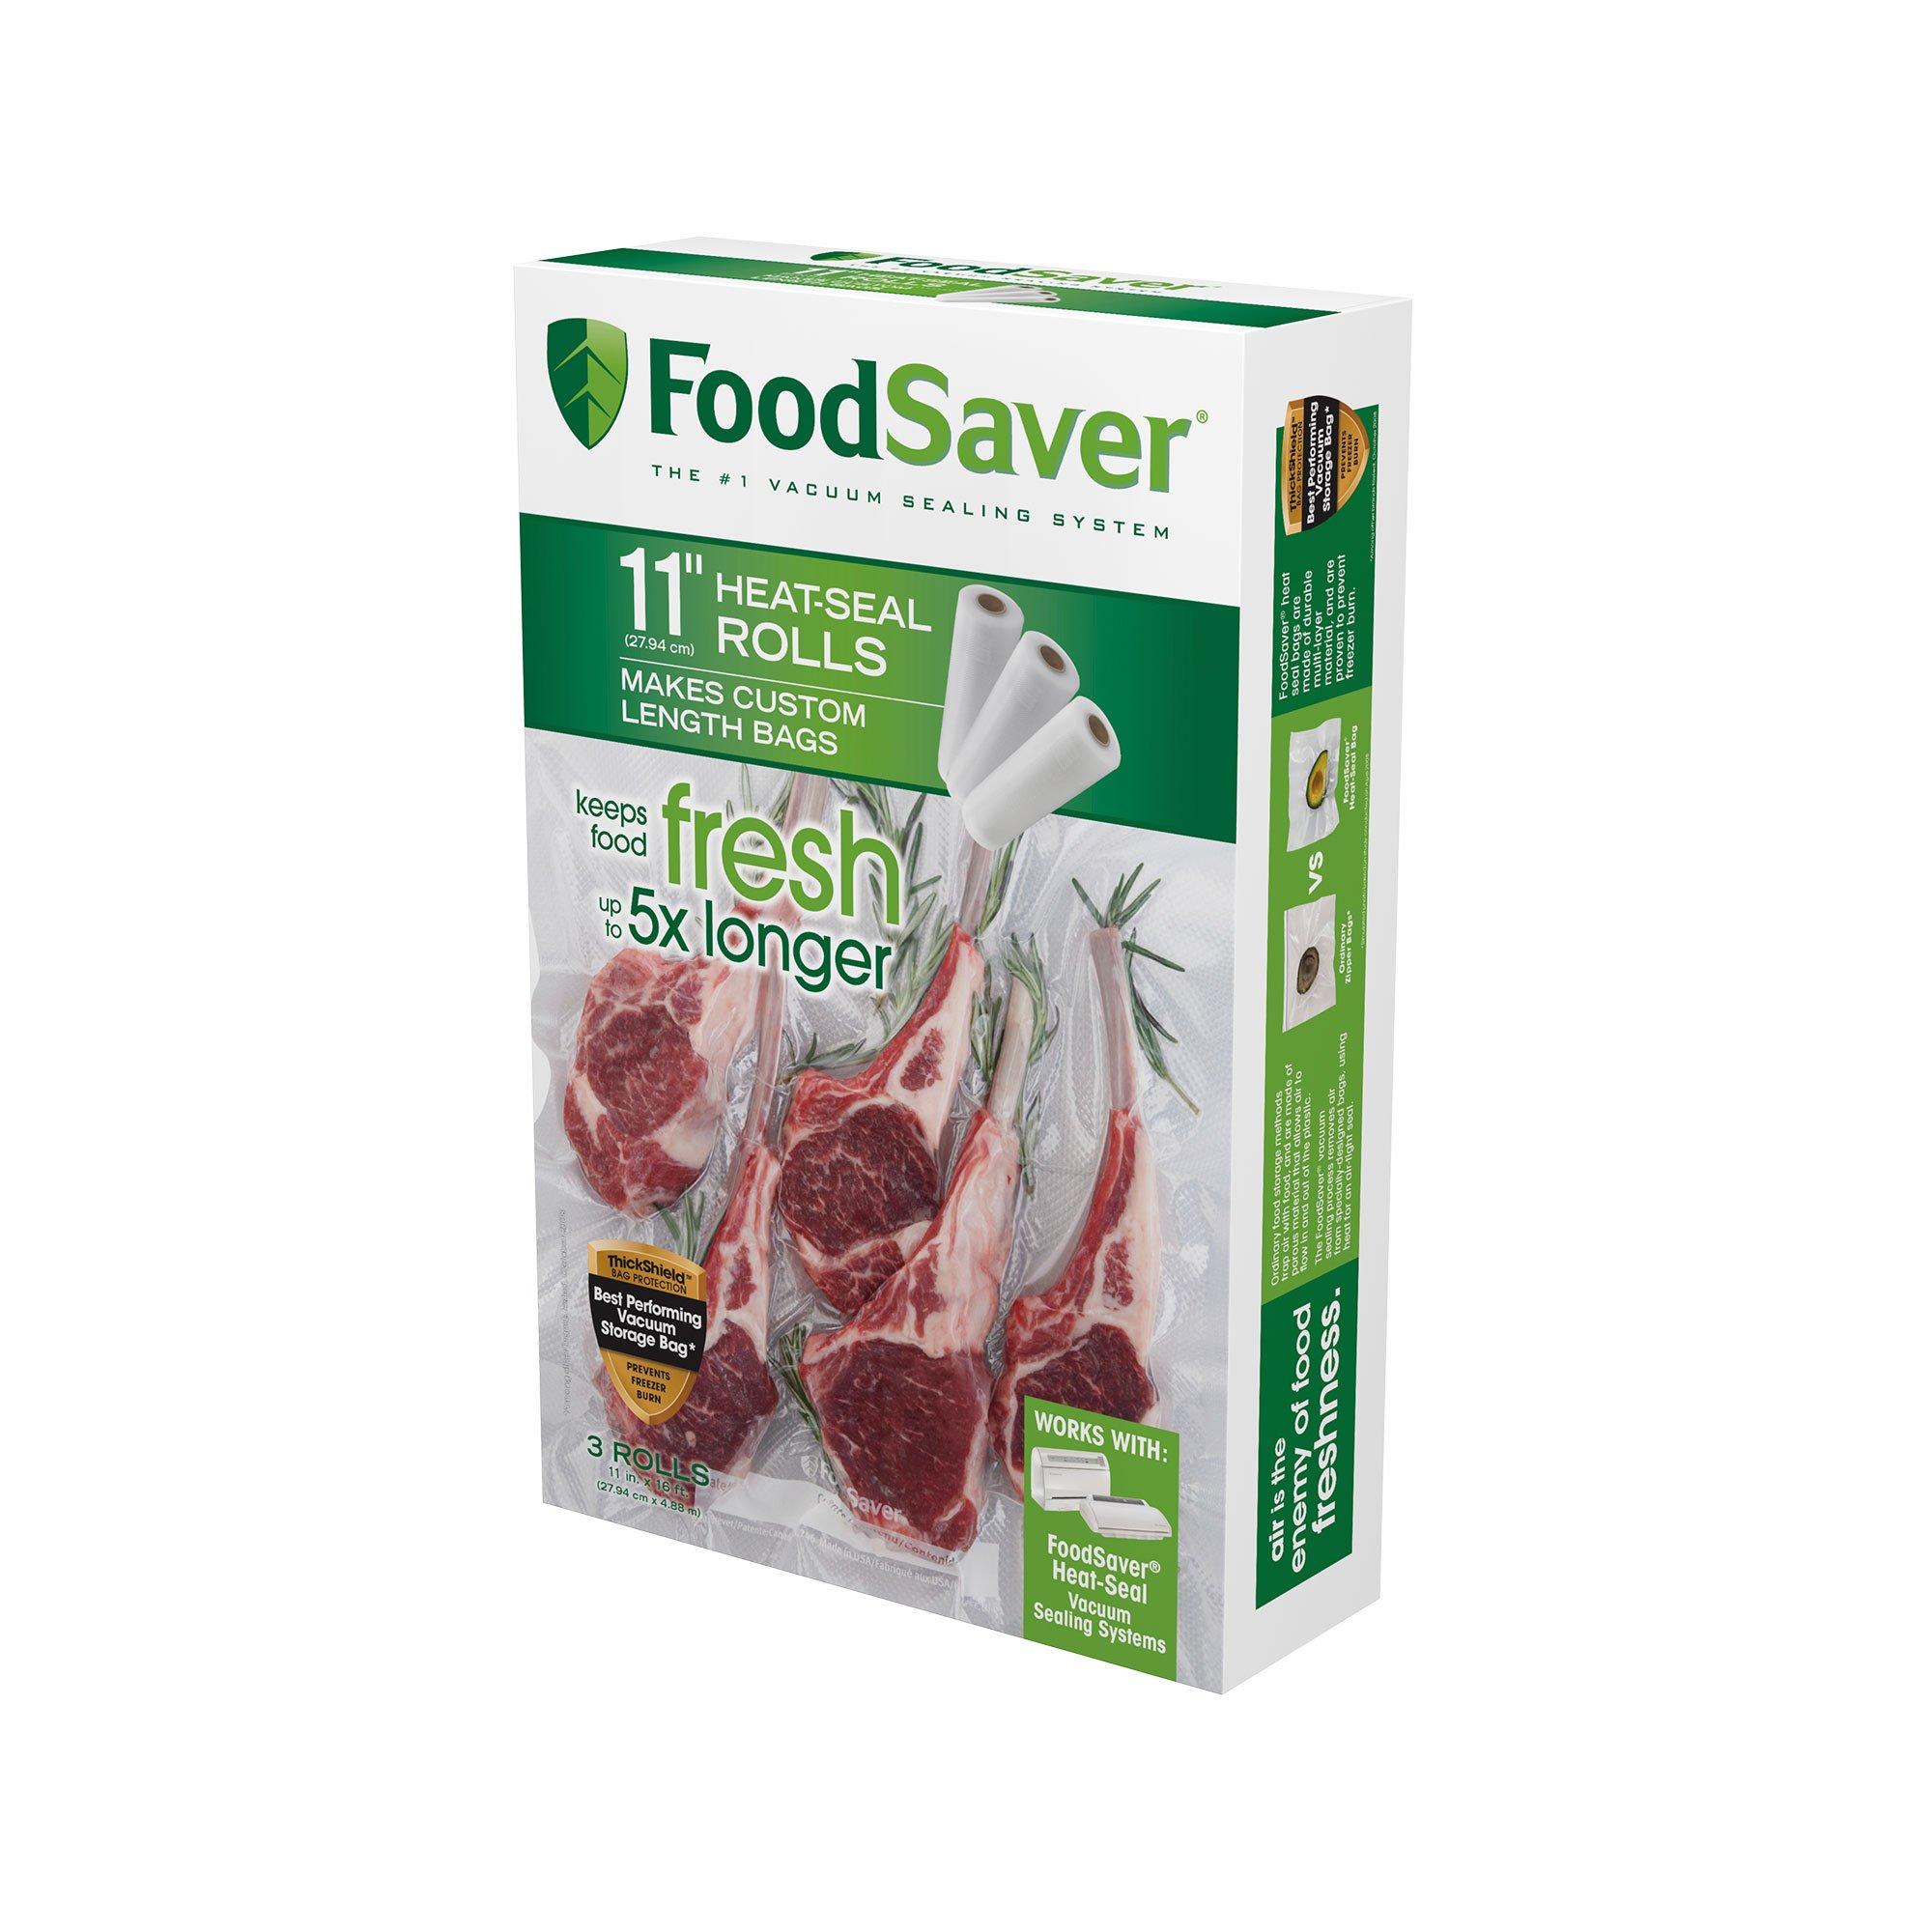 FoodSaver 11'' x 16' Vacuum Seal Roll | Make Custom-Sized BPA-Free Vacuum Sealer Bags | 3-Pack by FoodSaver